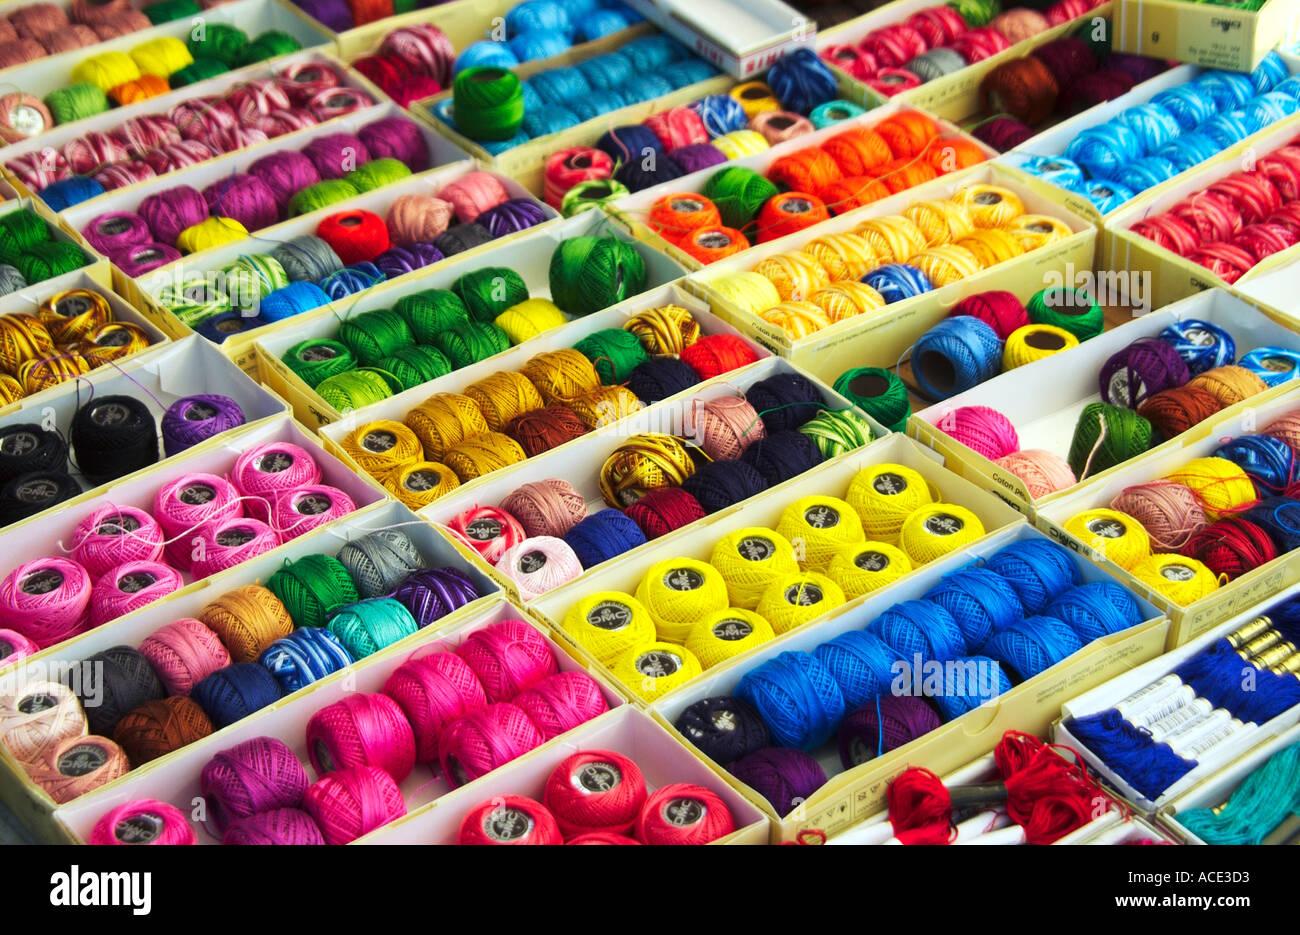 Buntes Tuch Thread und Textilien in den Comolapa Märkten in Guatemala, Mittelamerika Stockbild